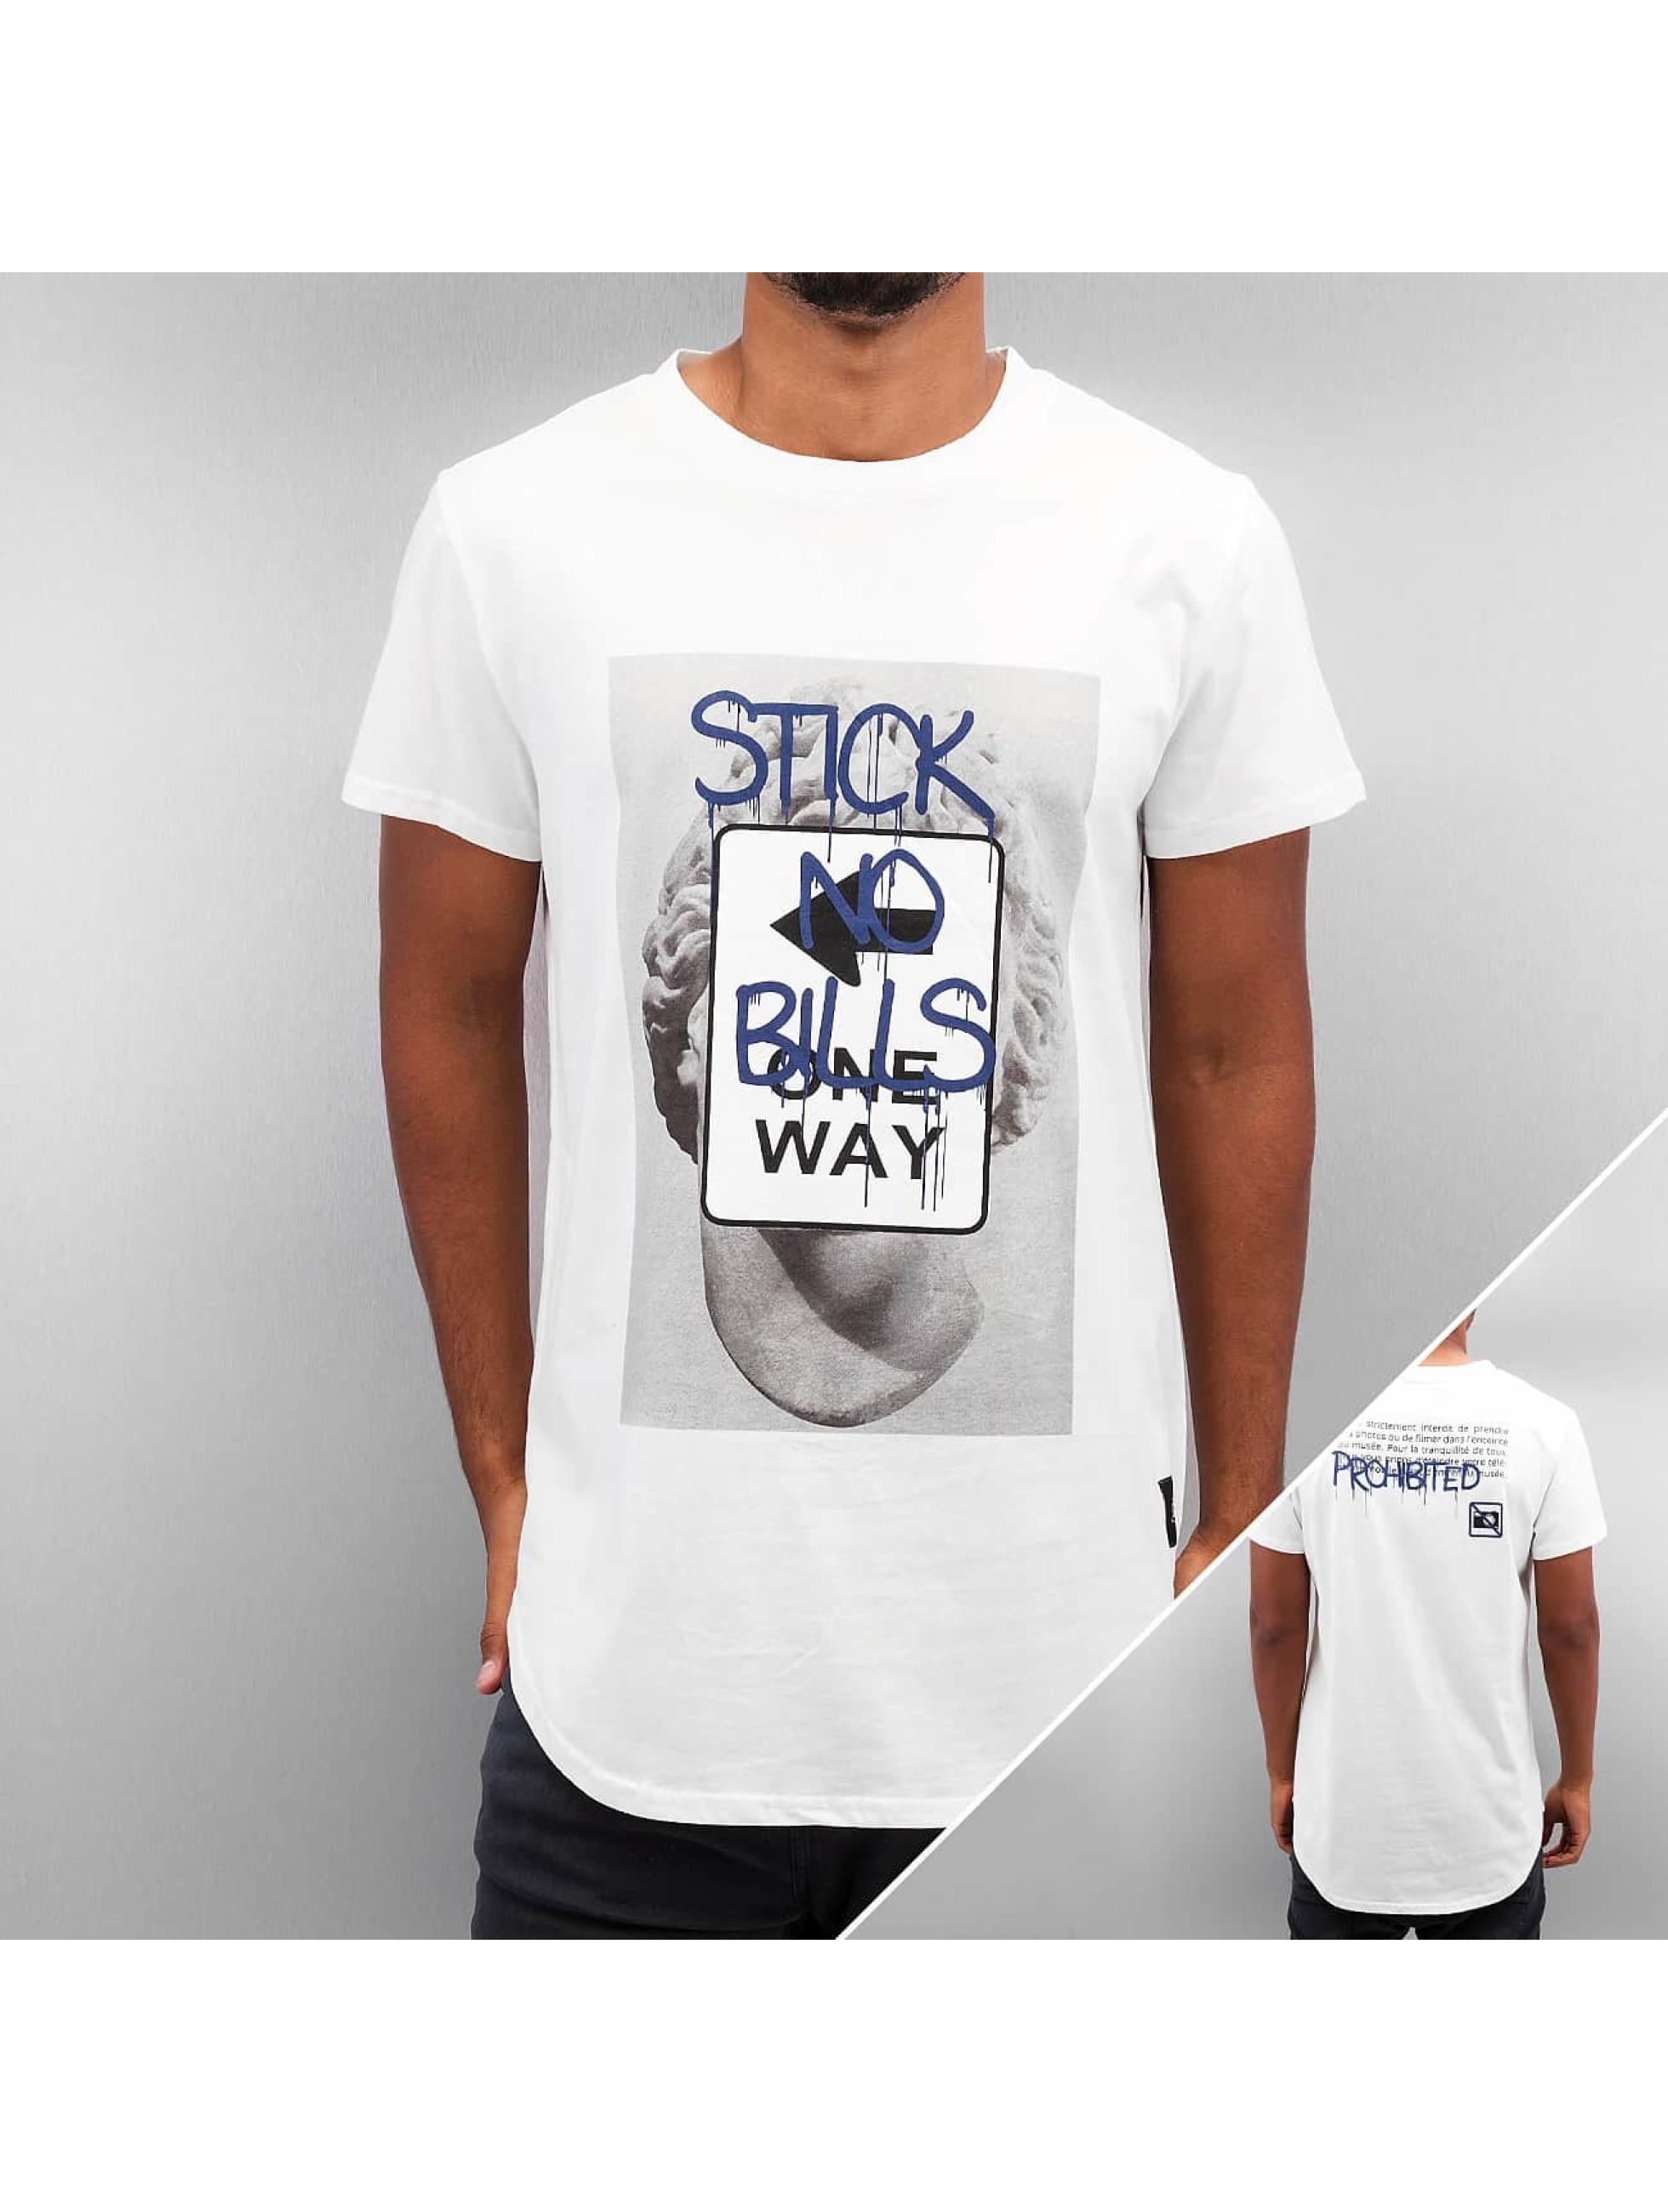 Sixth June Stick No Bills T-Shirt White Sale Angebote Gablenz